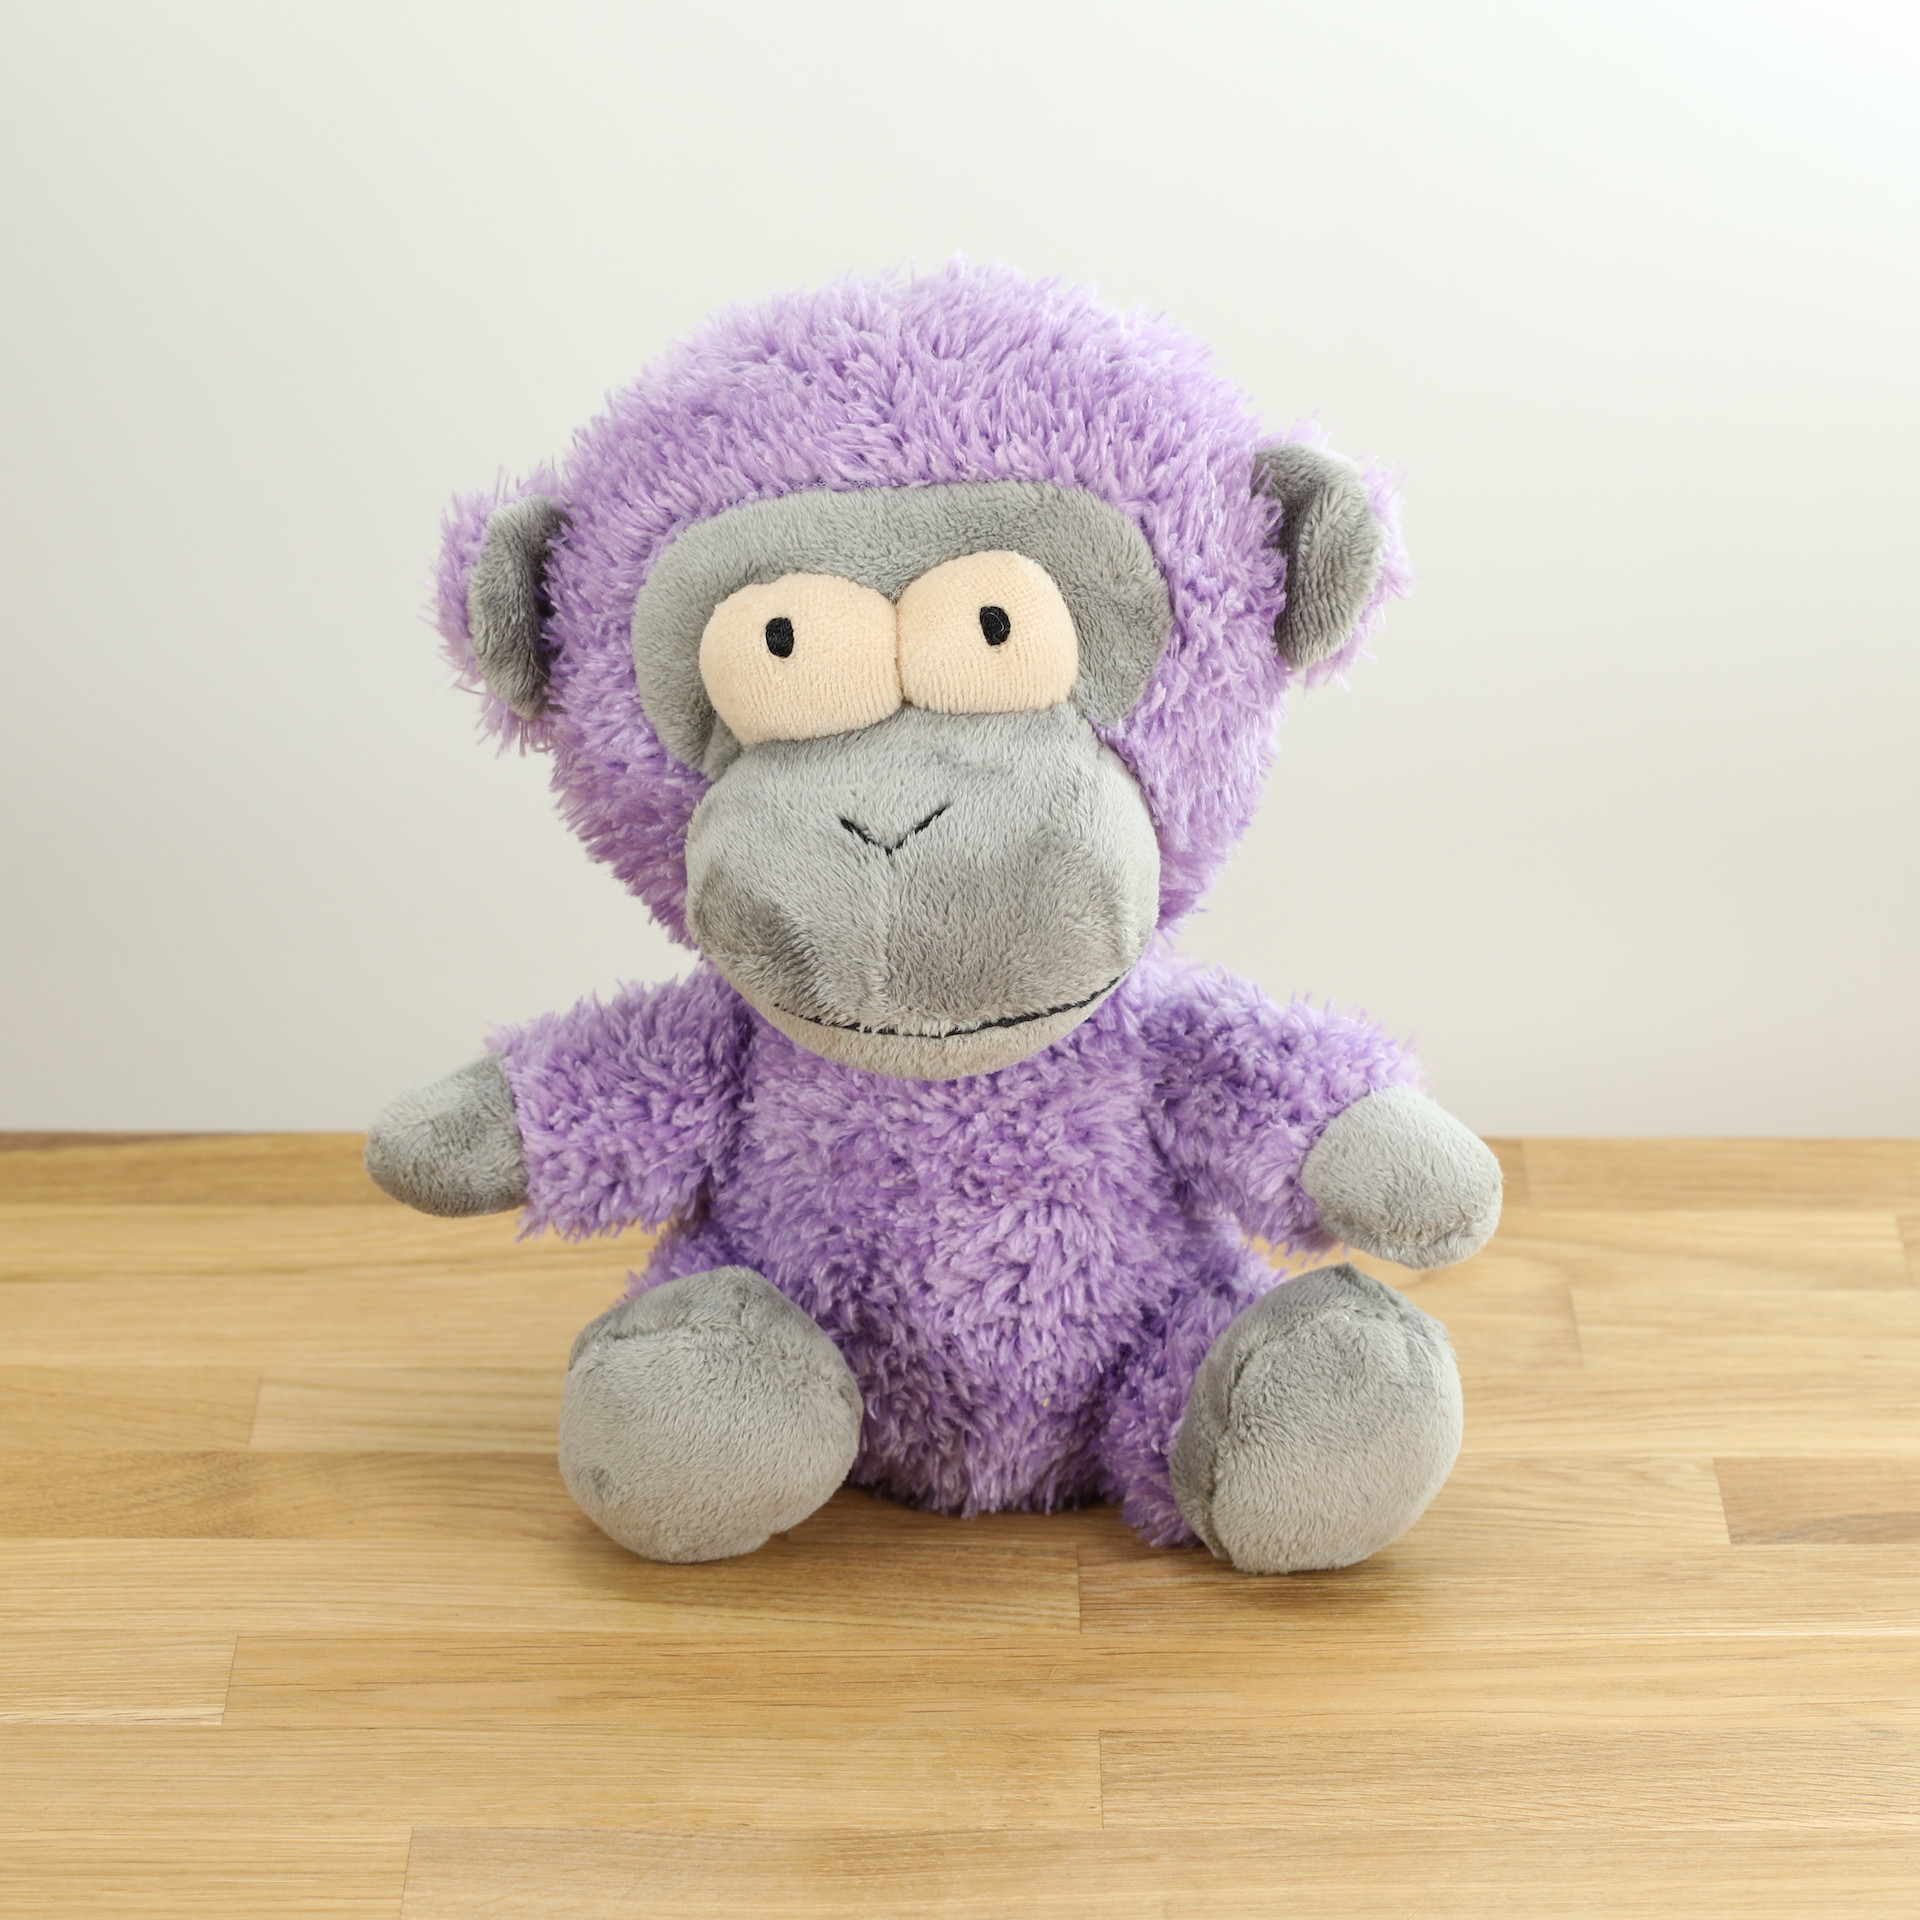 Hundespielzeug Magic, der Affe